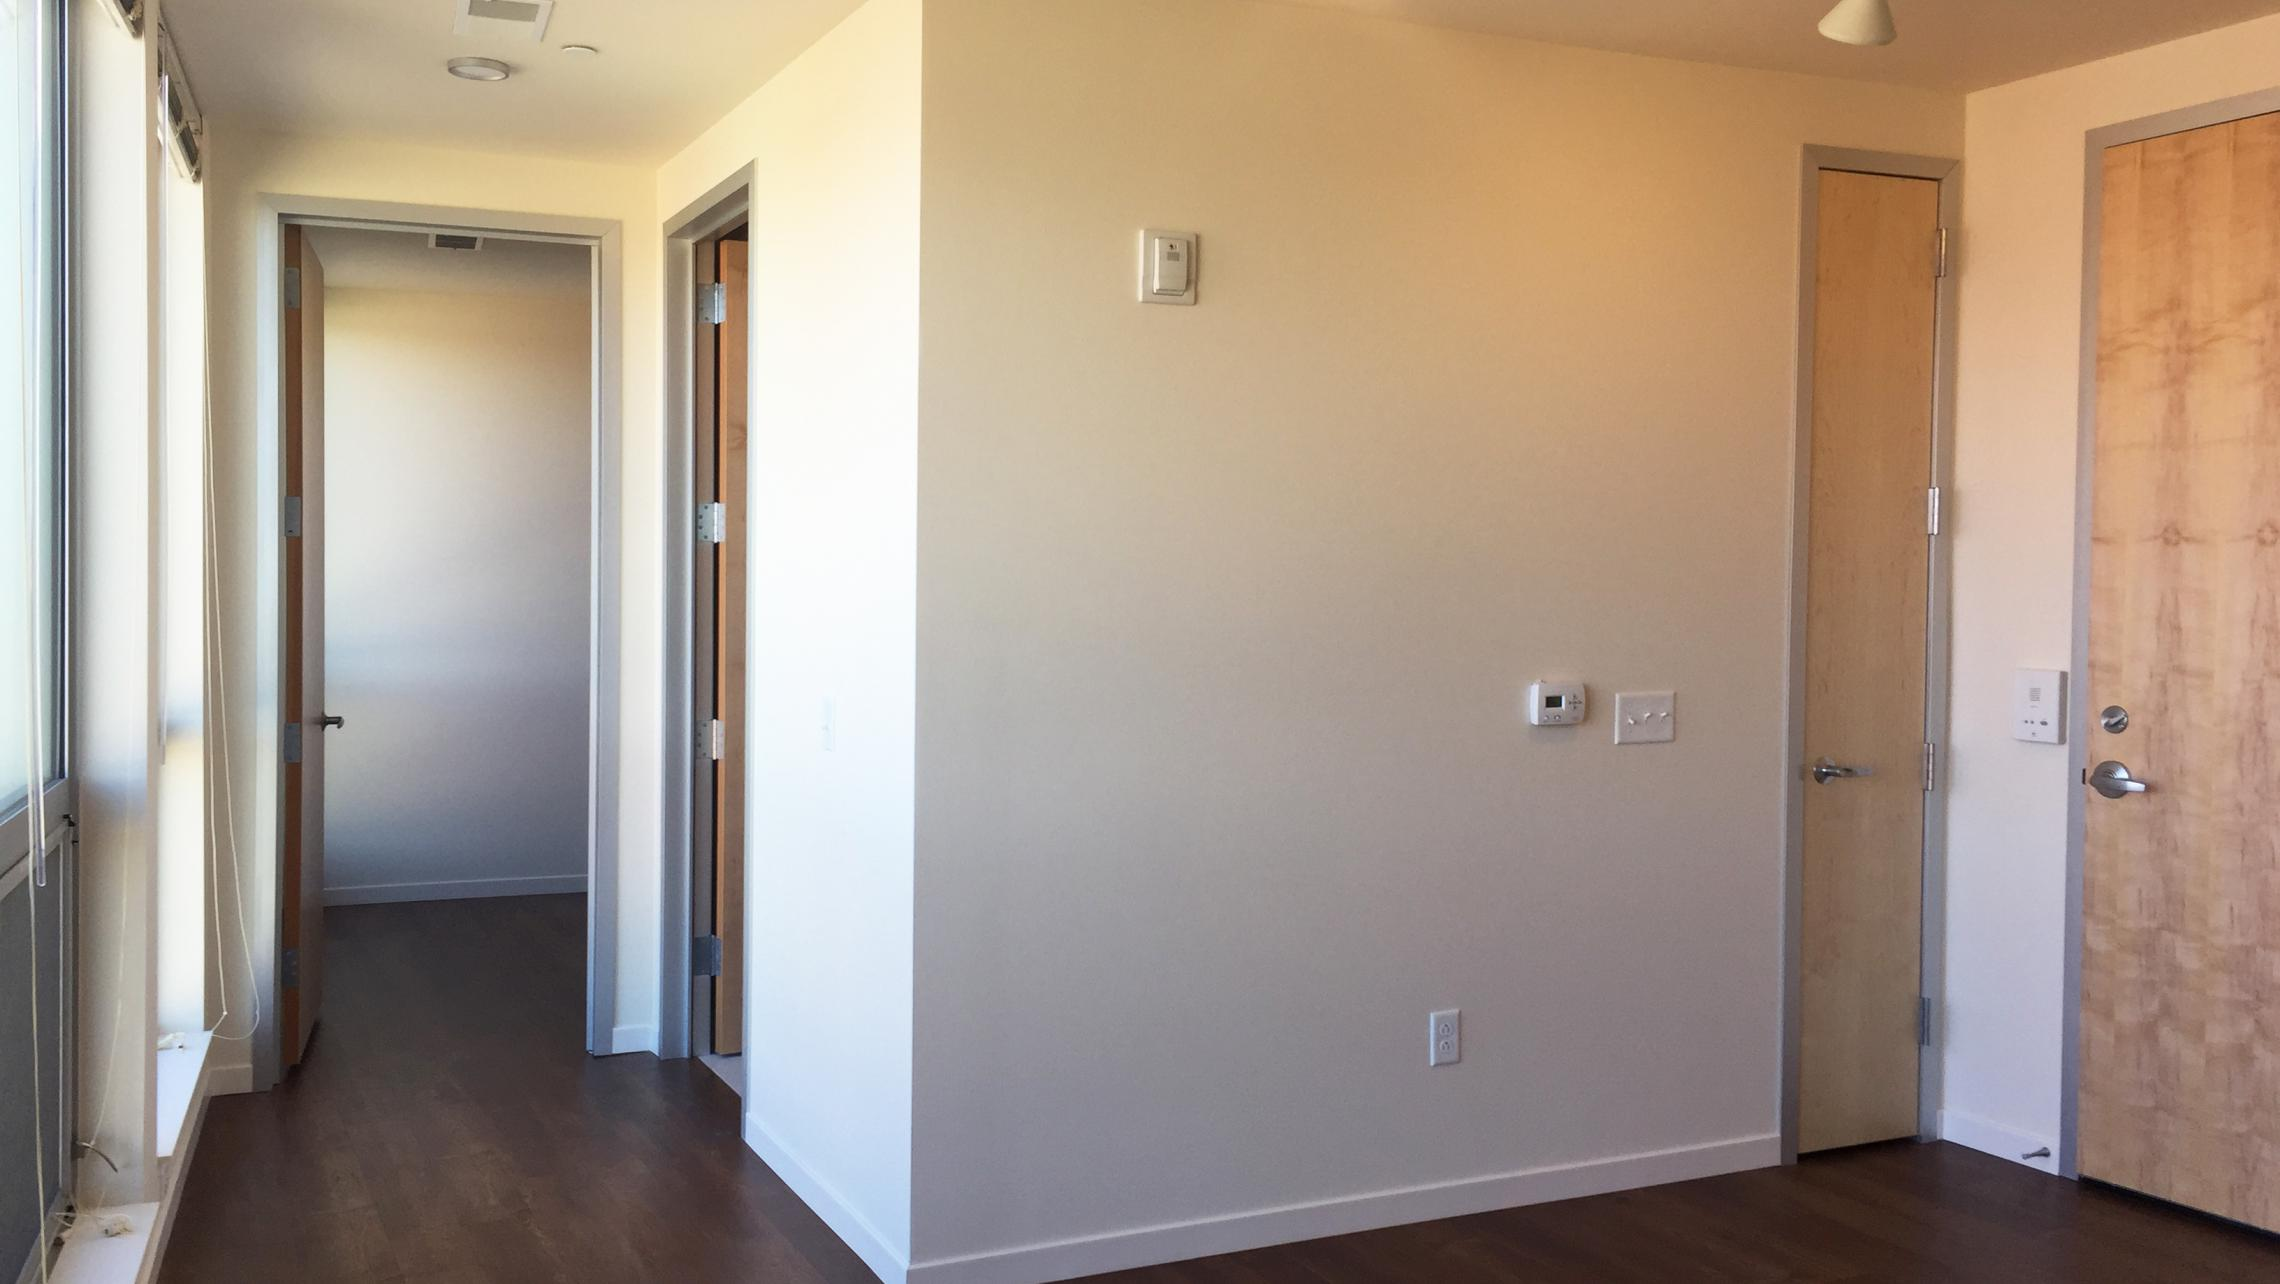 ULI Nine Line Apartment 210 - Living Room